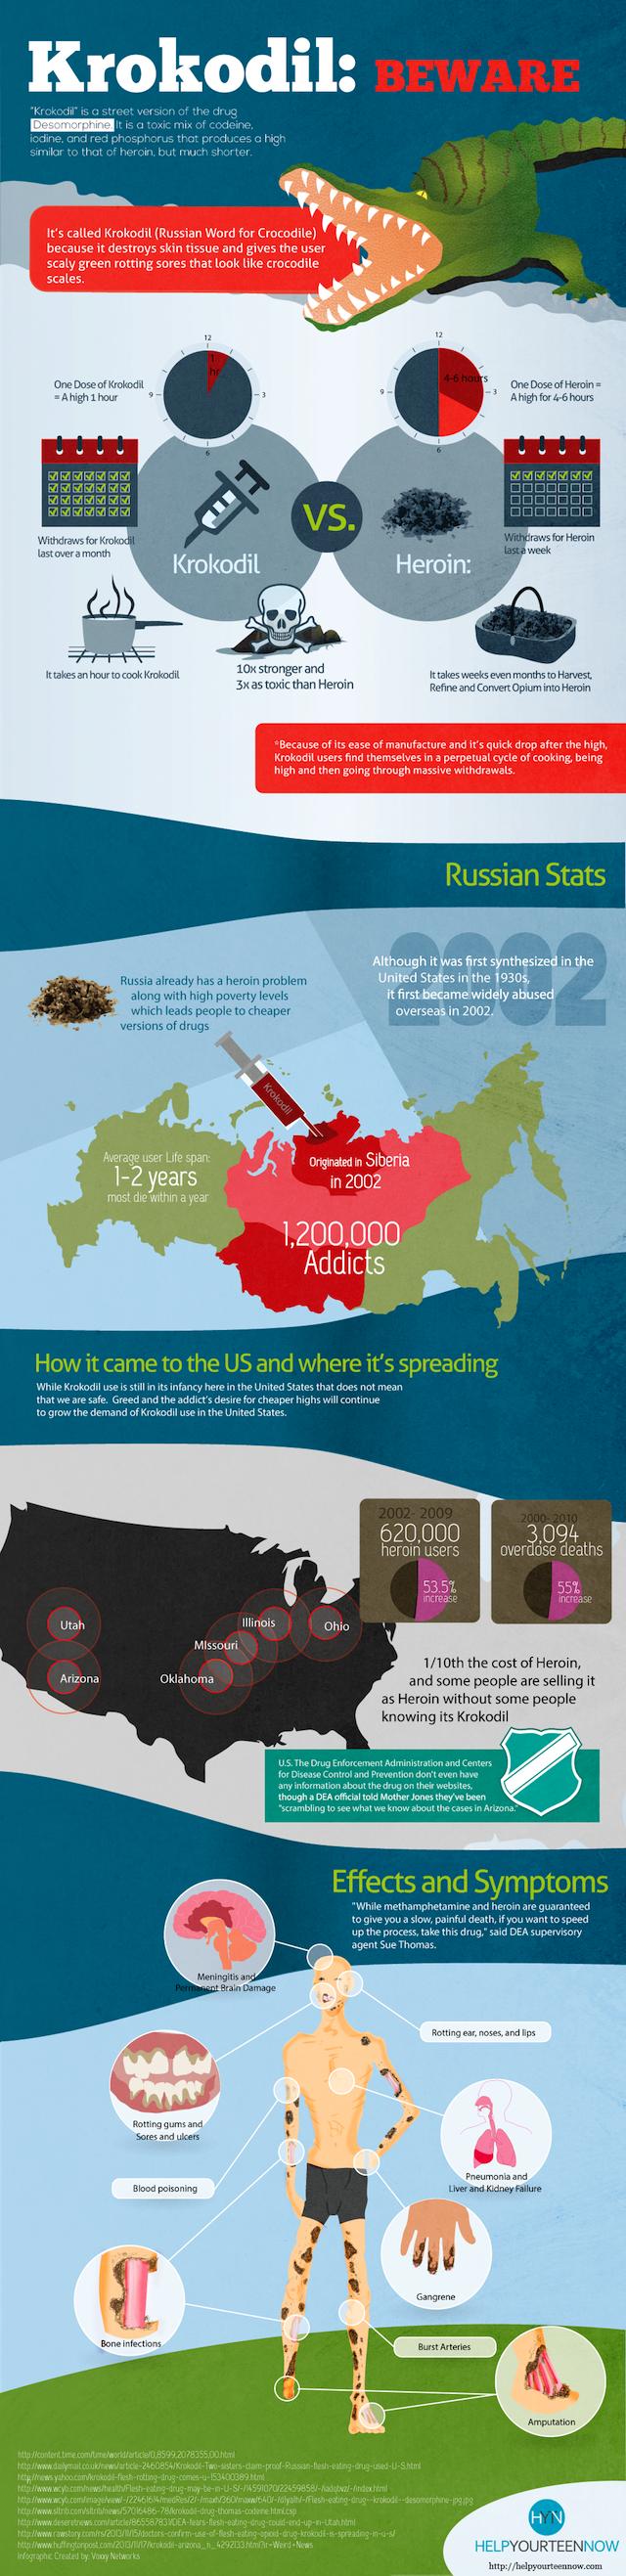 krokodil infographic